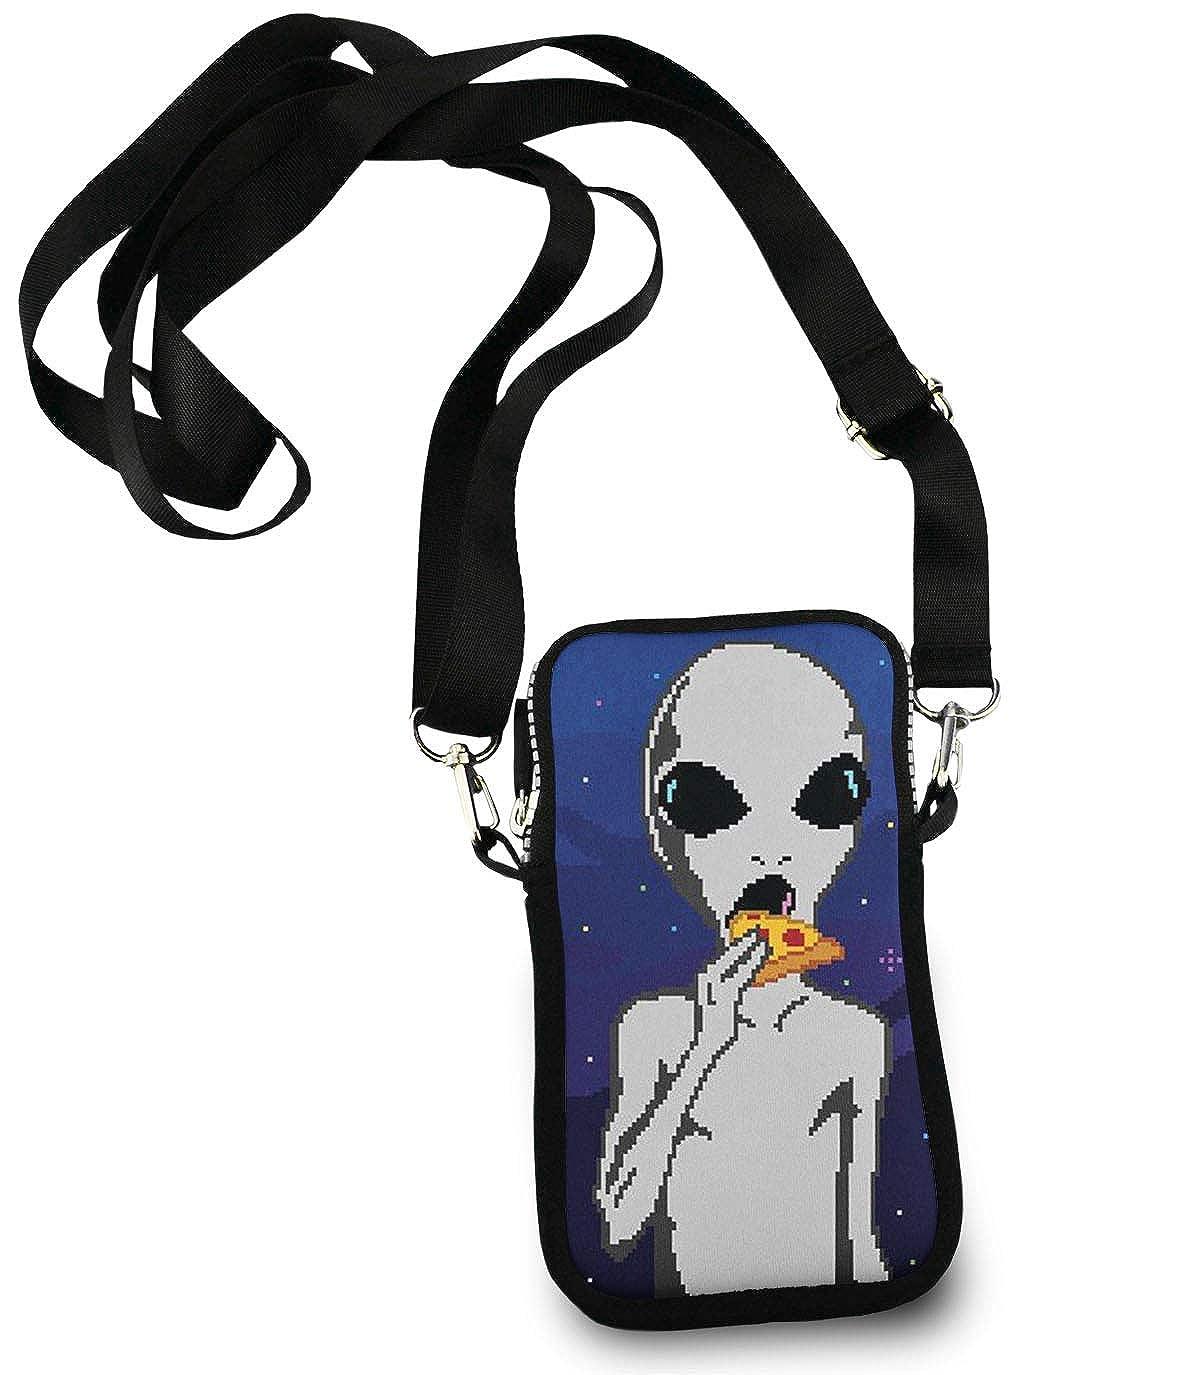 Cell Phone Purse Mini Crossbody Bag Smartphone Wallet Headphone Bag Alien Eat Pizza Cool